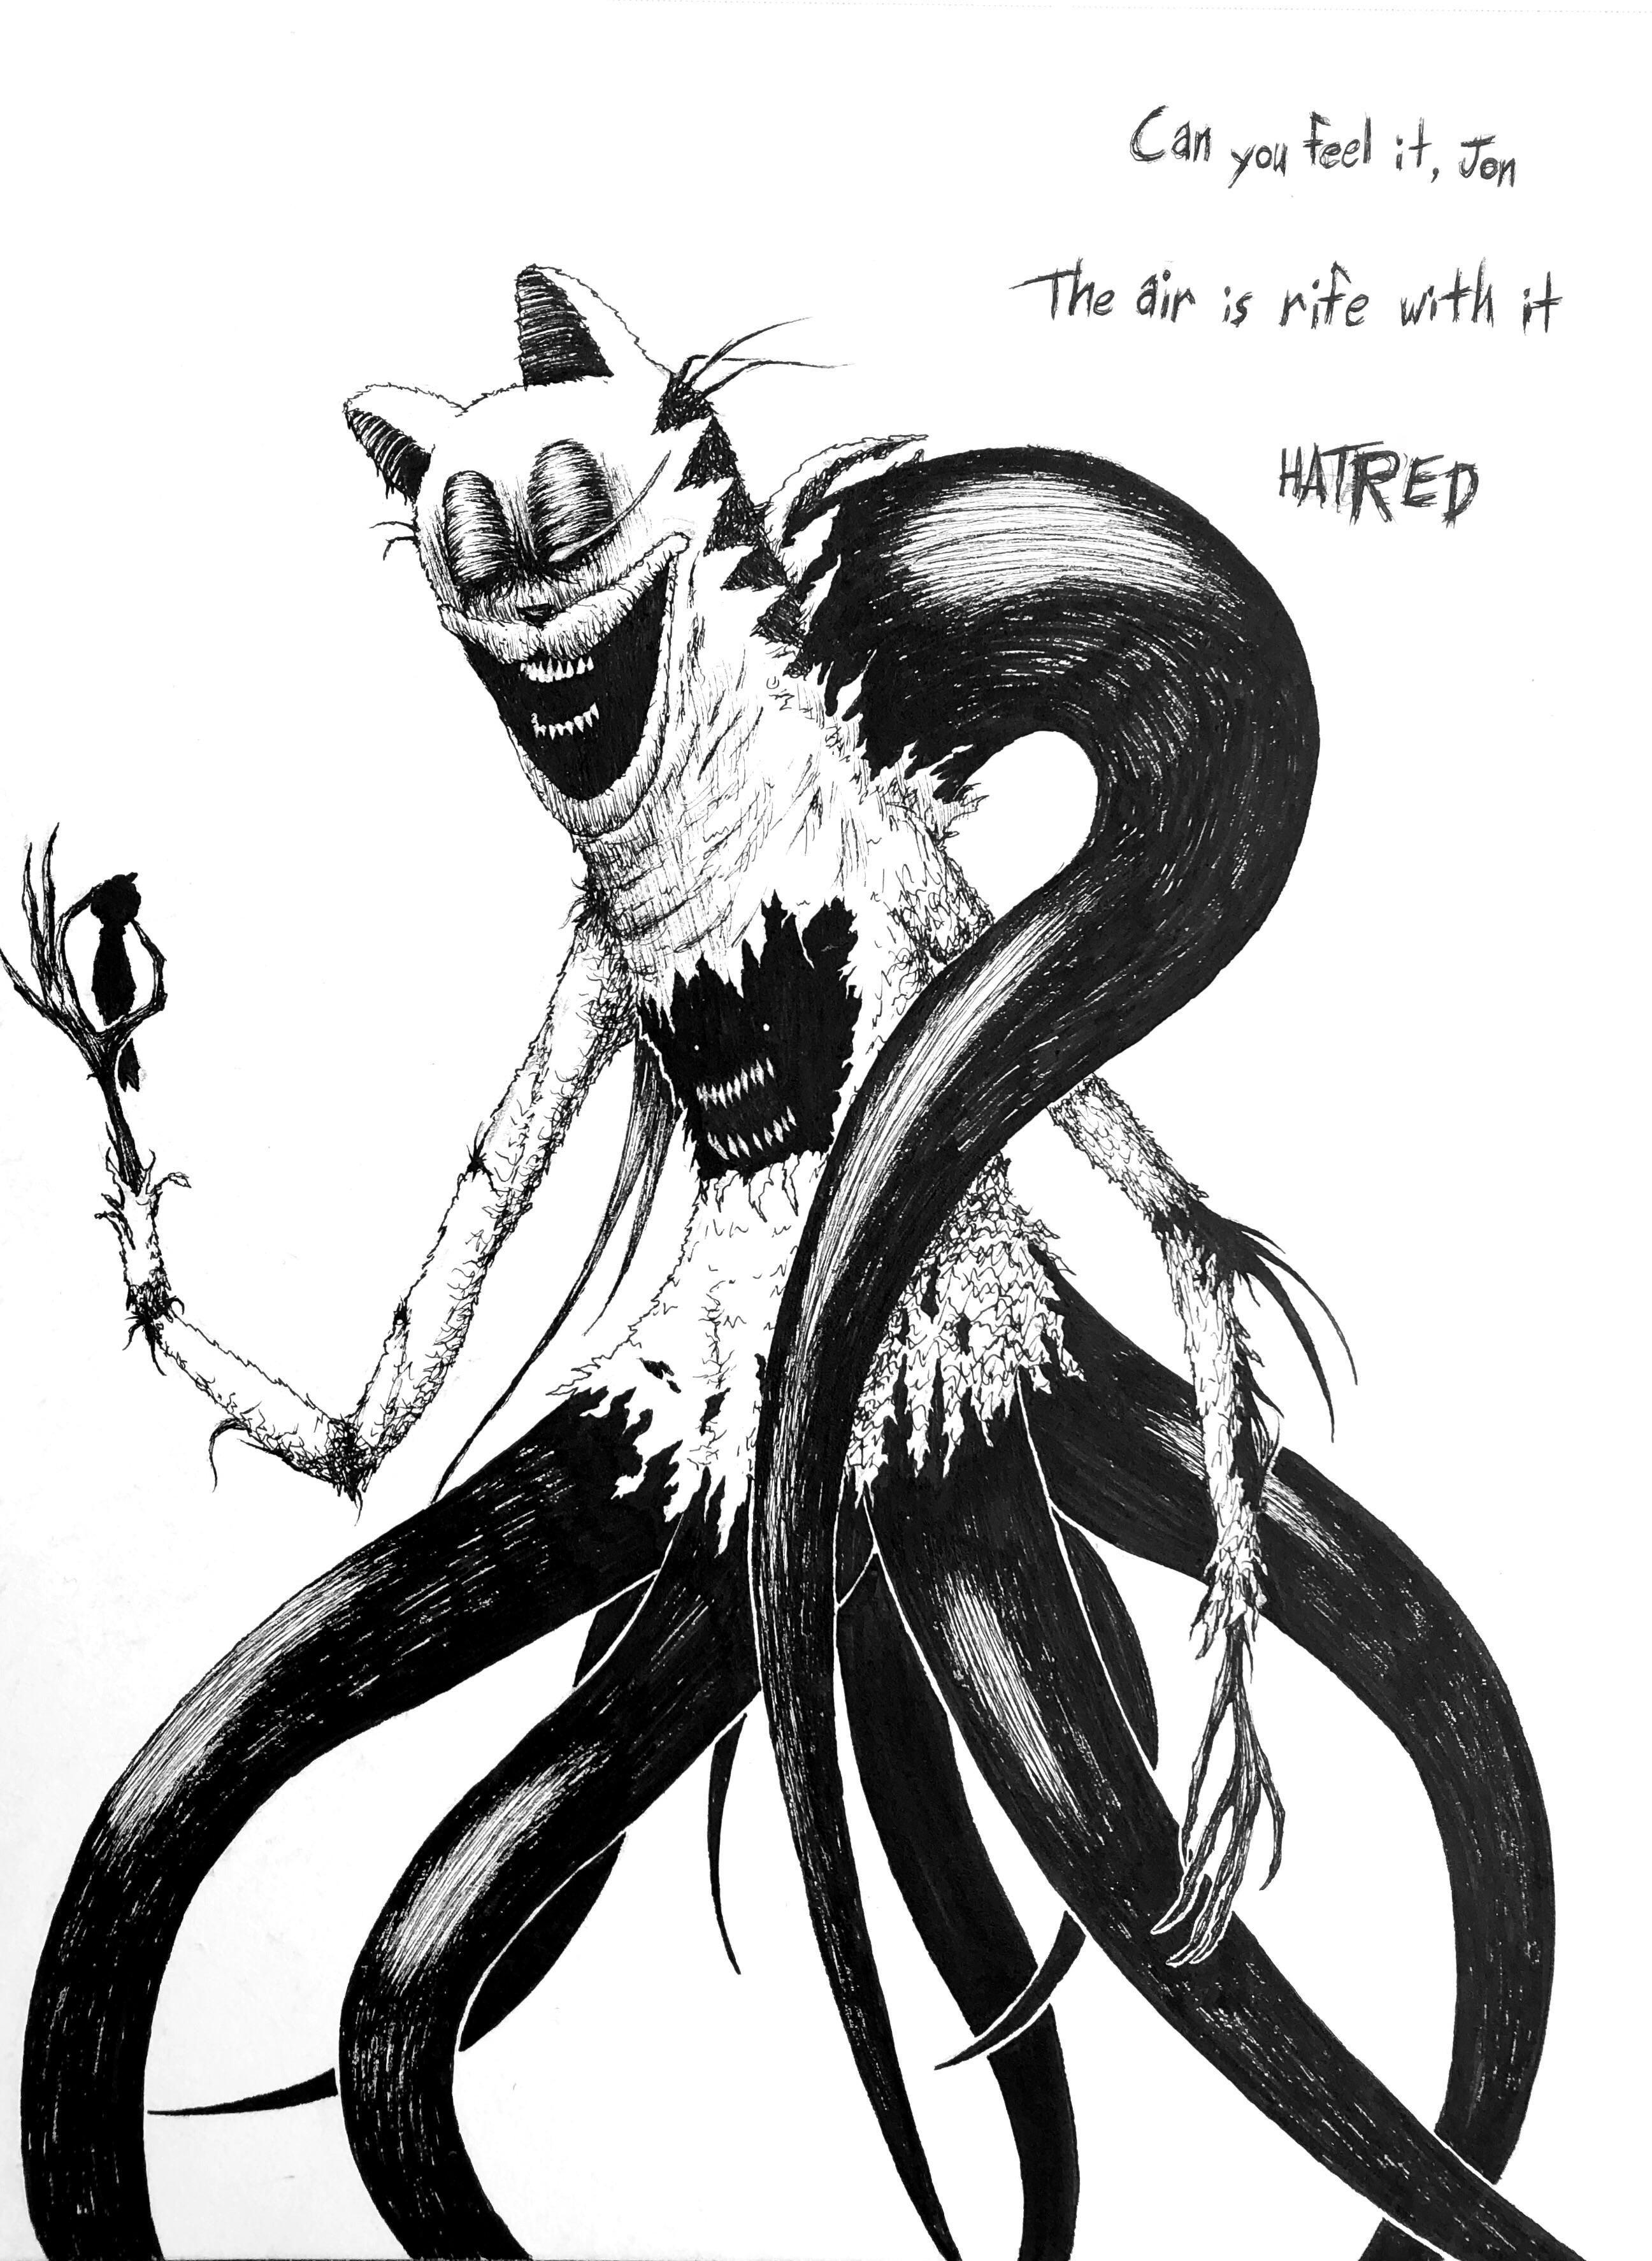 It S Festering Jon Creepy Garfield Scary Art Creepy Creepy Images